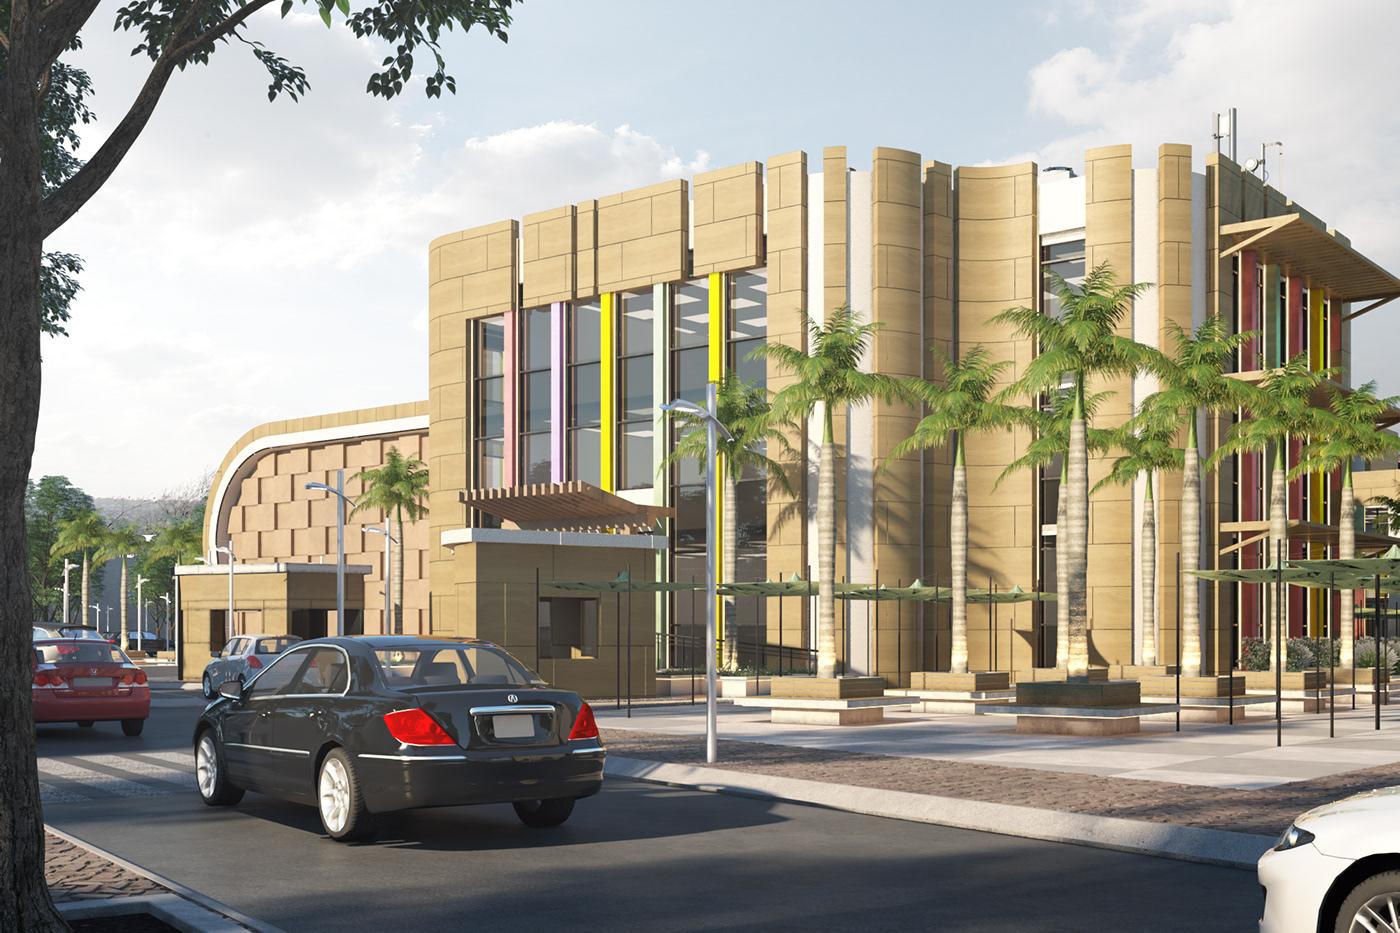 architecture exterior design exterior design creative decor modern art Style Motaz mostafa